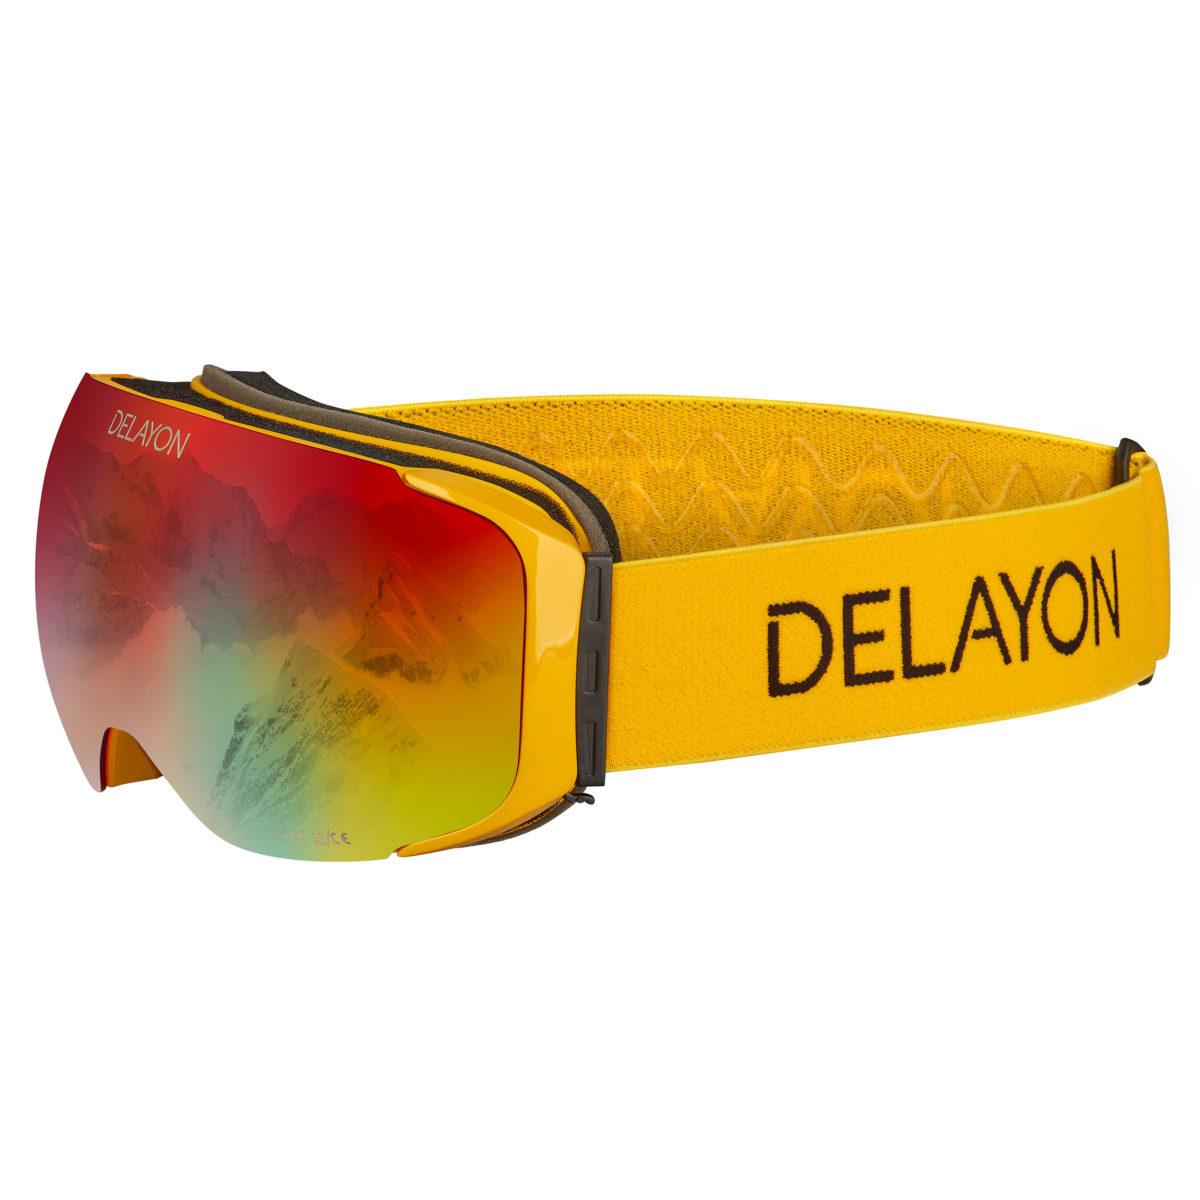 DELAYON Eyewear Explorer Goggle Space Fire Hornet Yellow